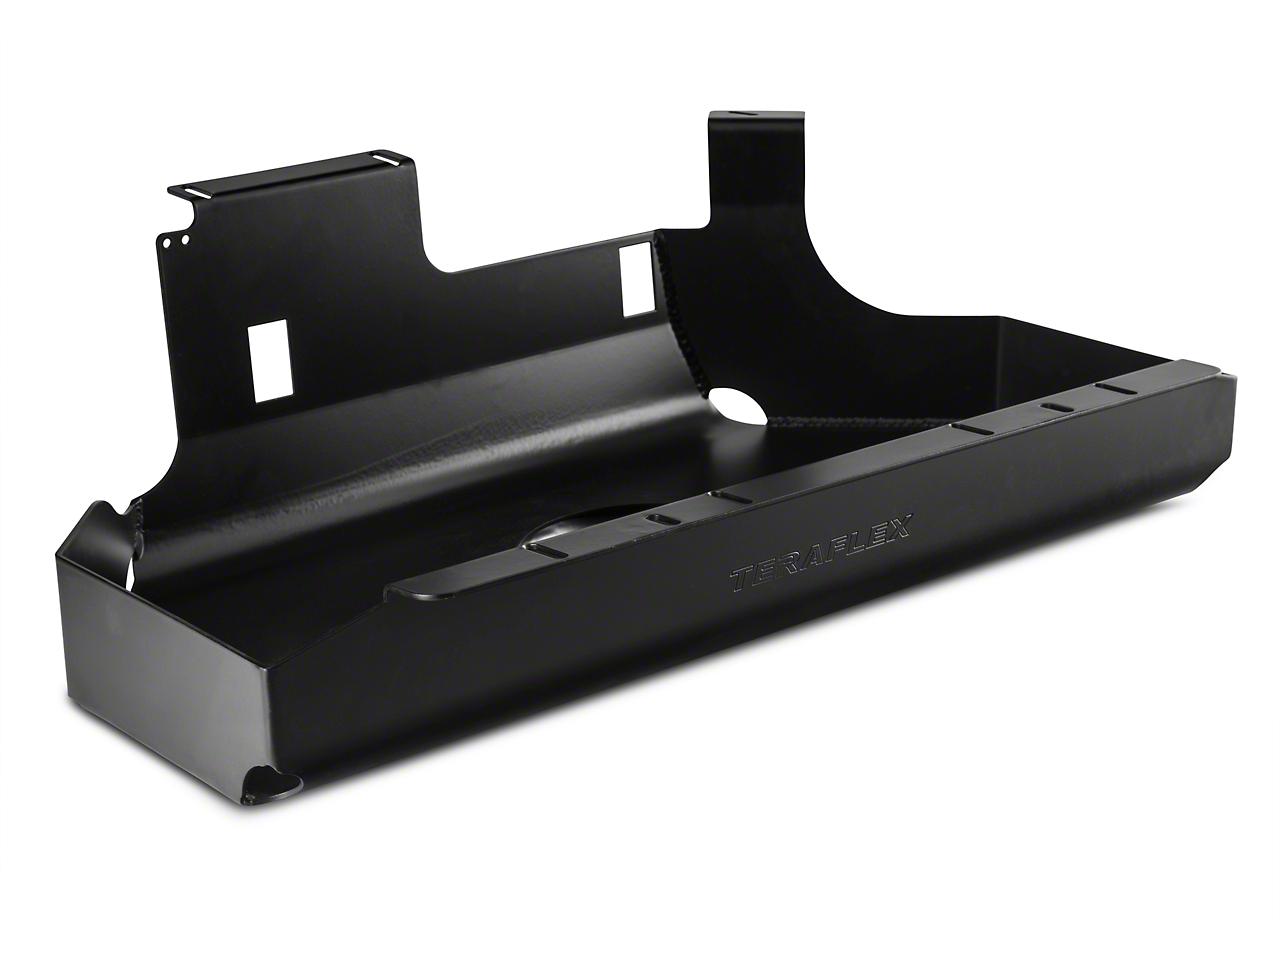 Teraflex HD Gas Tank Skid Plate (97-06 Wrangler TJ)